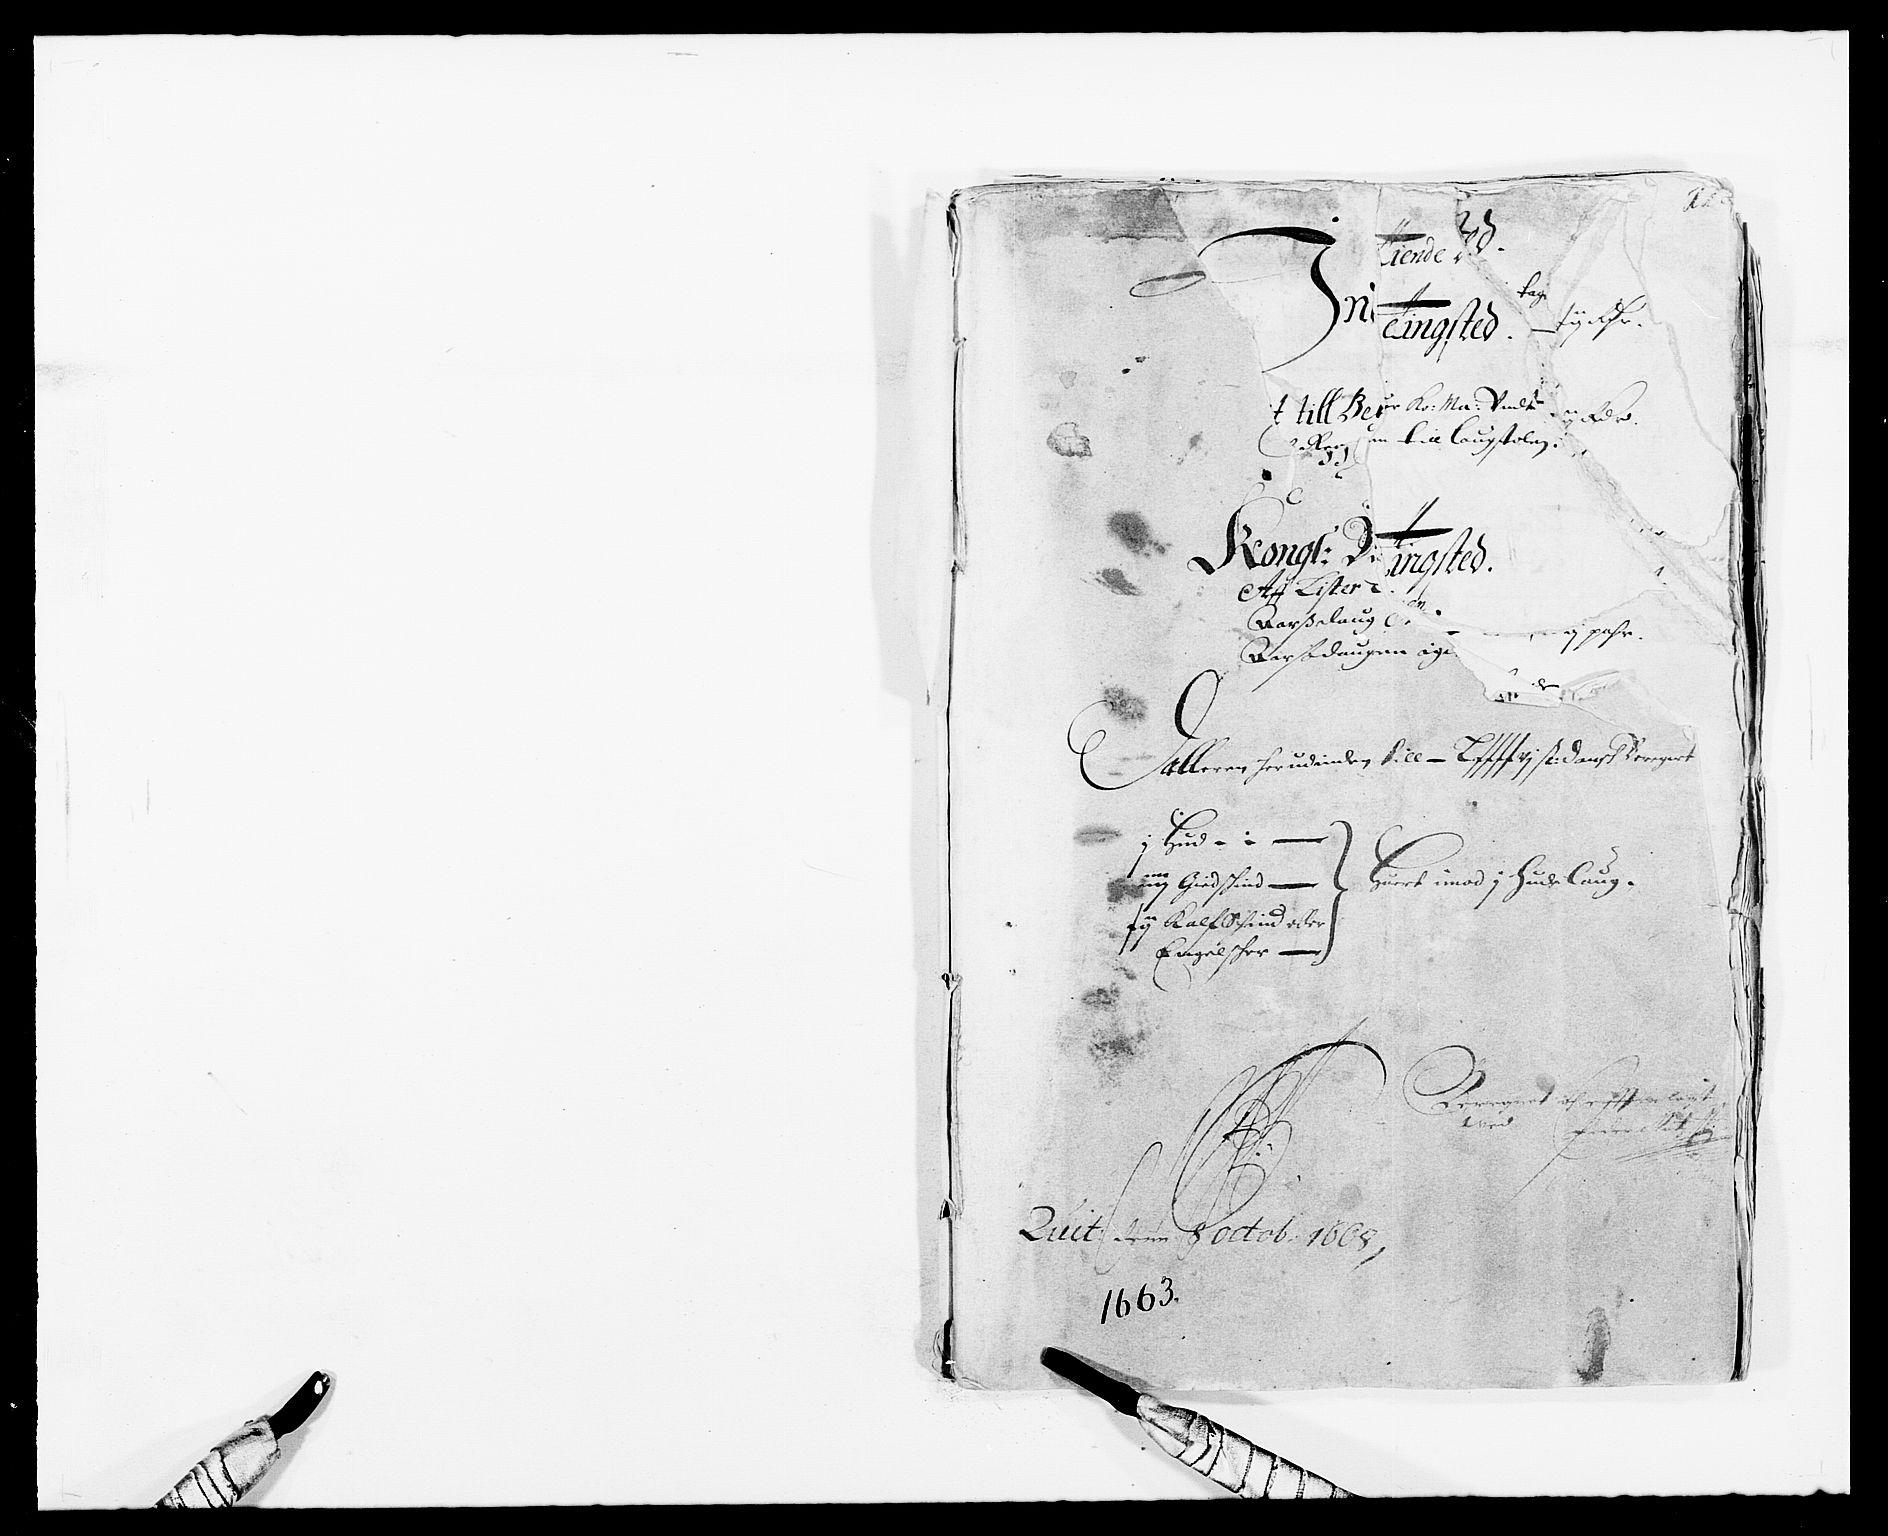 RA, Rentekammeret inntil 1814, Reviderte regnskaper, Fogderegnskap, R41/L2523: Fogderegnskap Lista, 1663-1664, s. 1